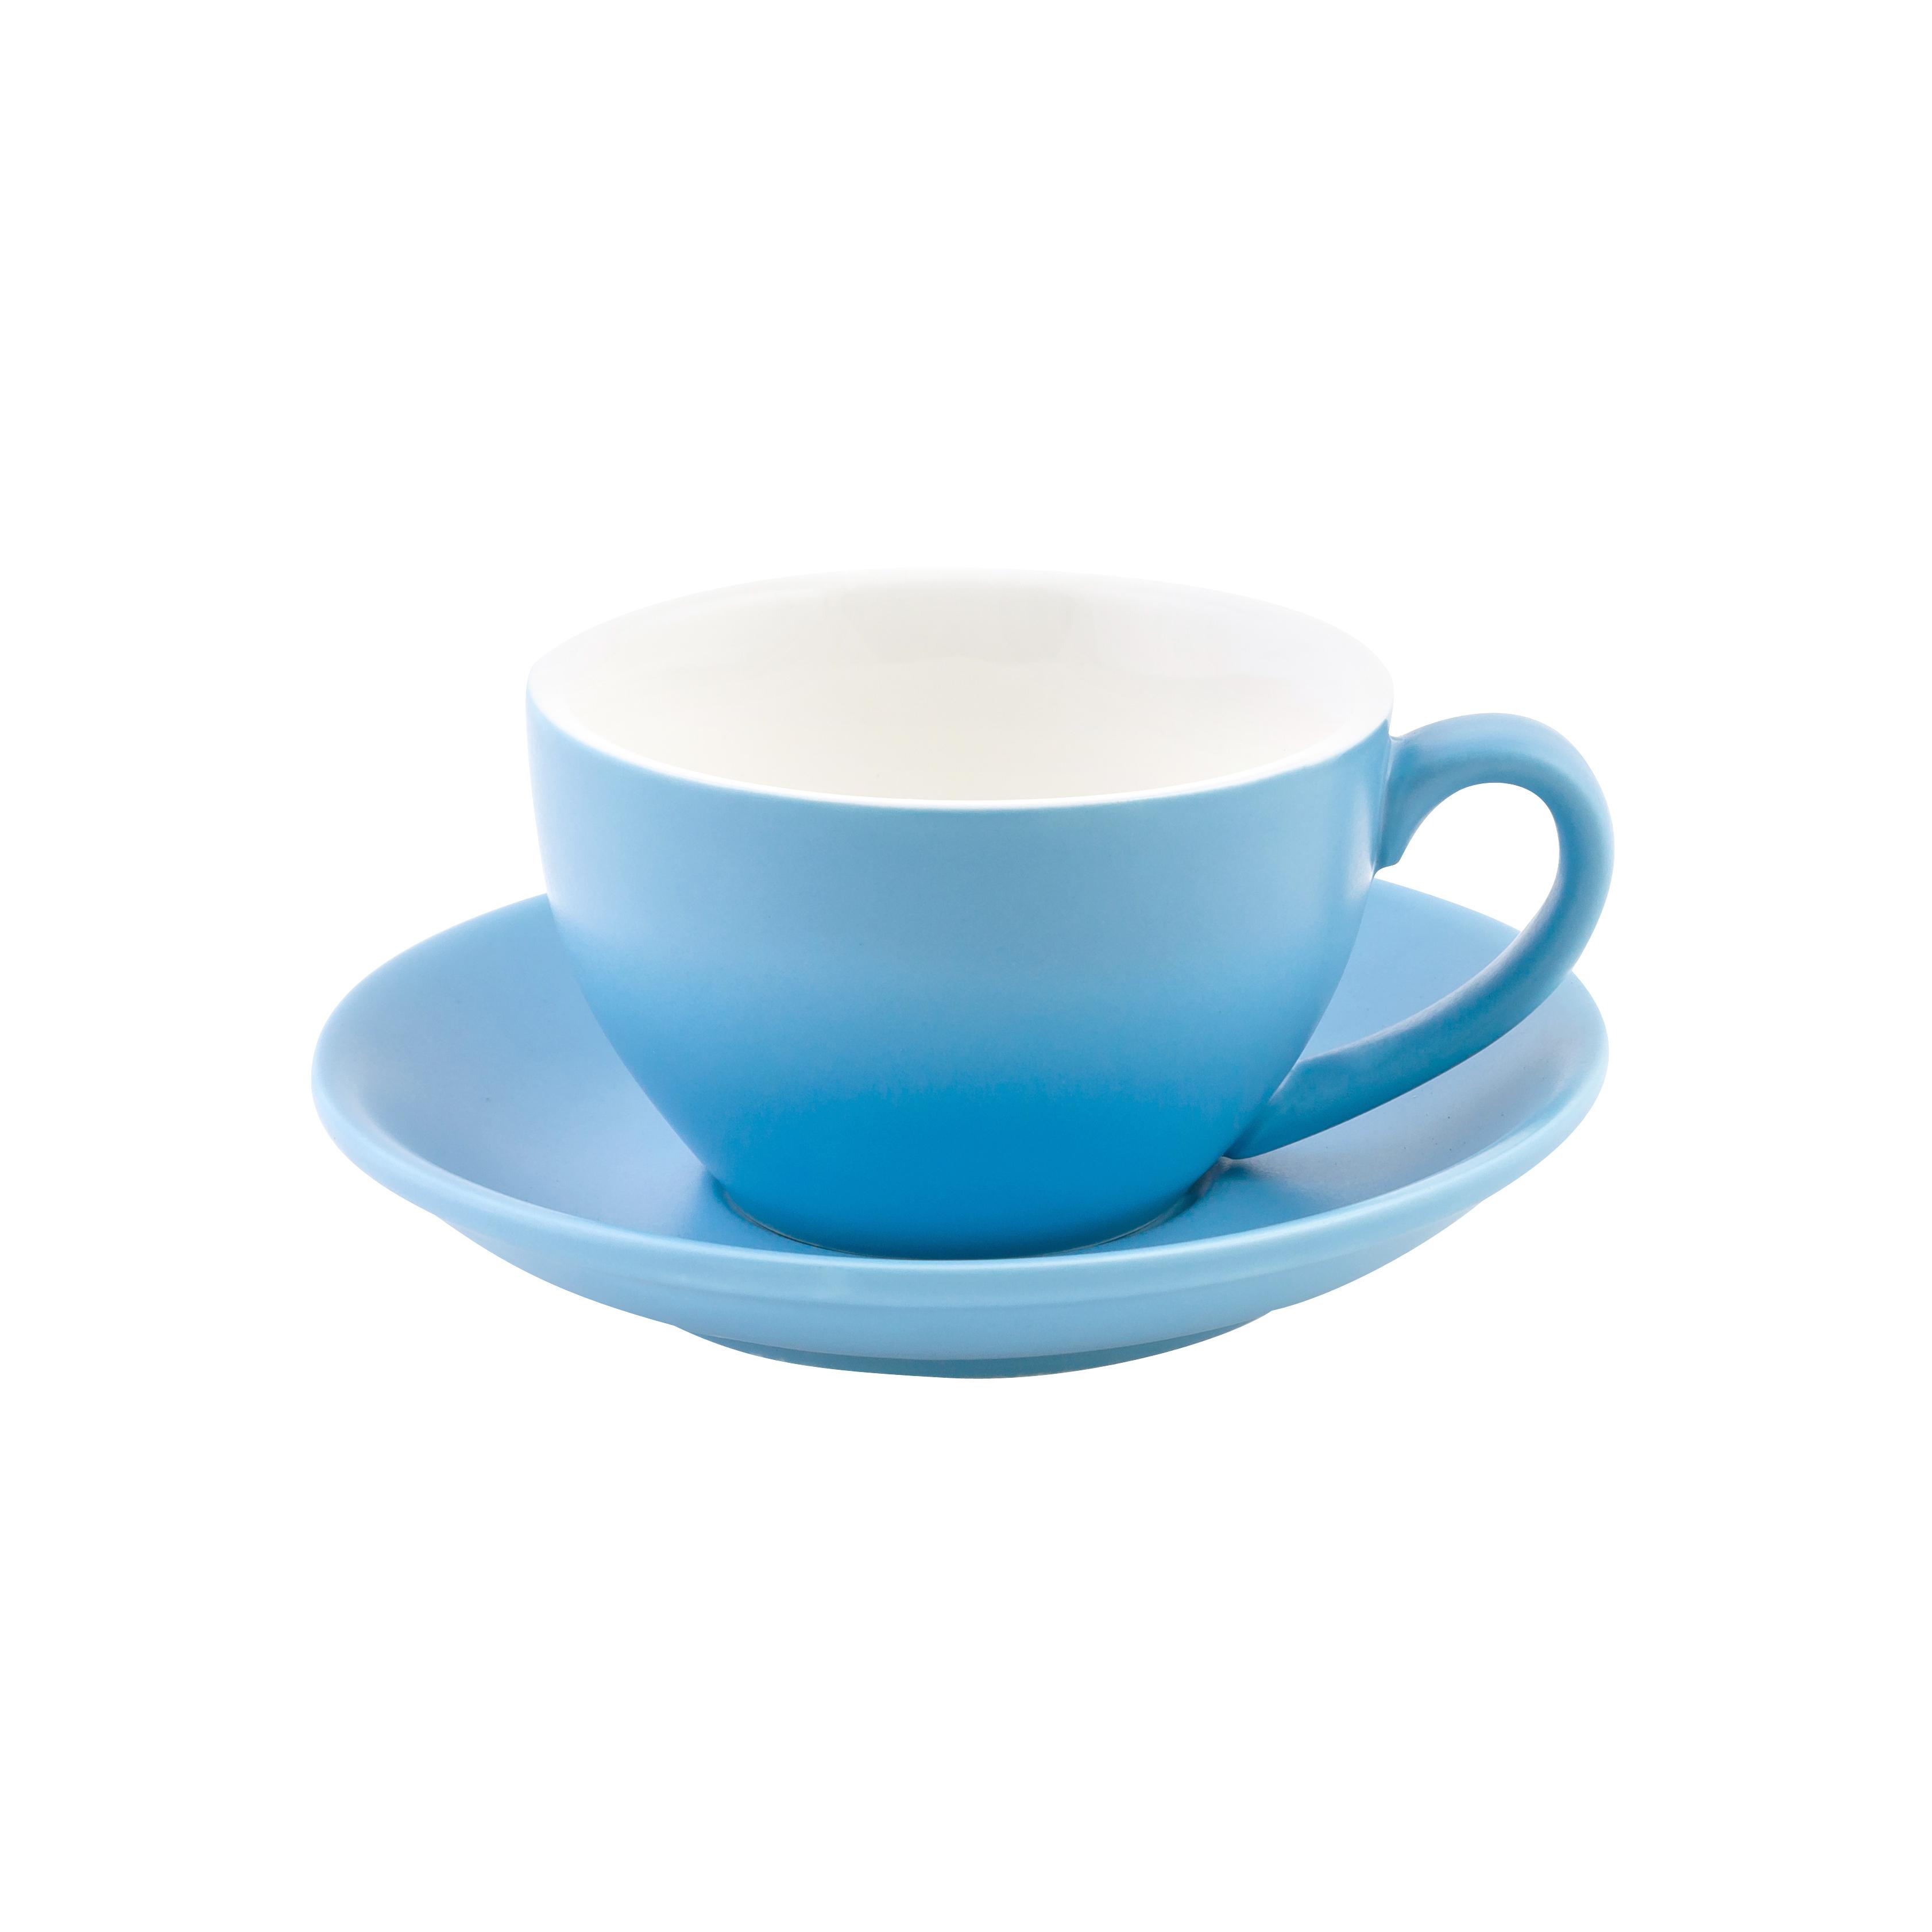 Intorno Coffee/Tea Cup & Saucer